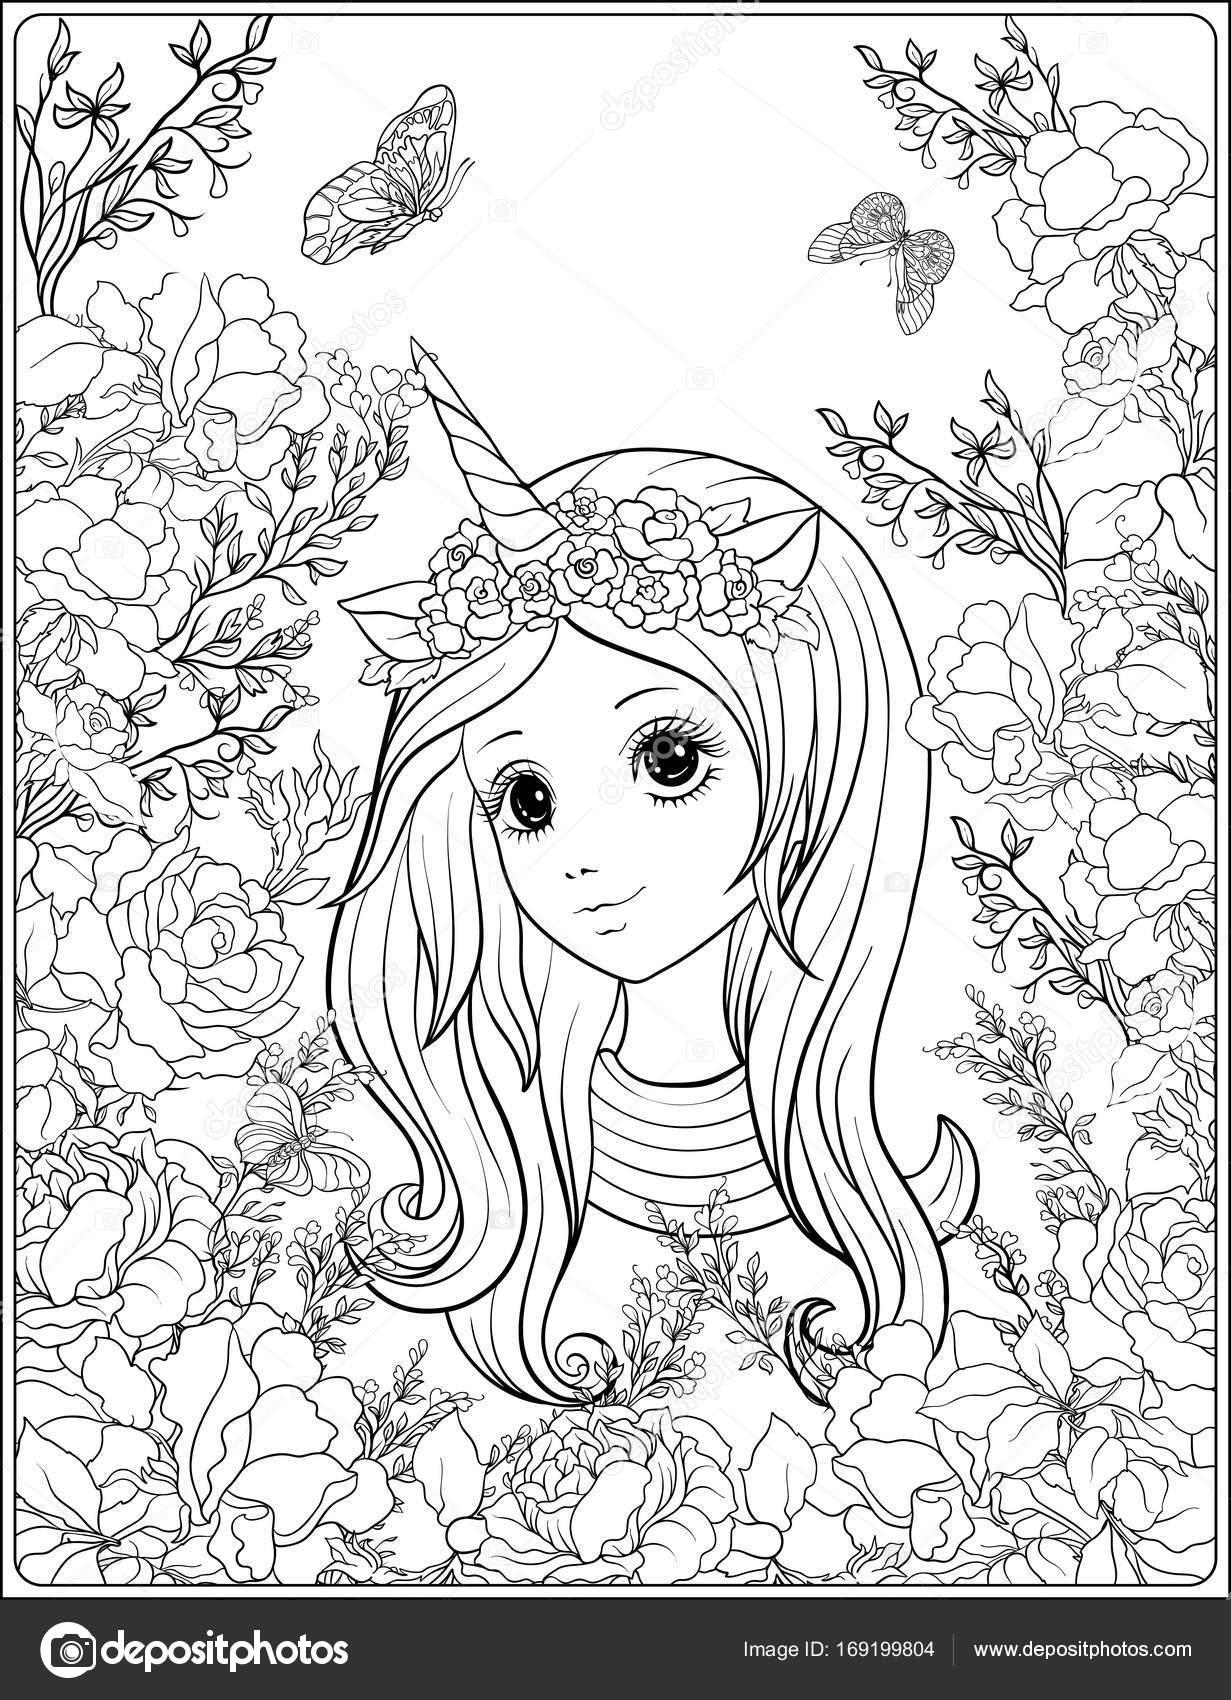 Imágenes Unicornios Animados Kawaii Para Colorear Chica